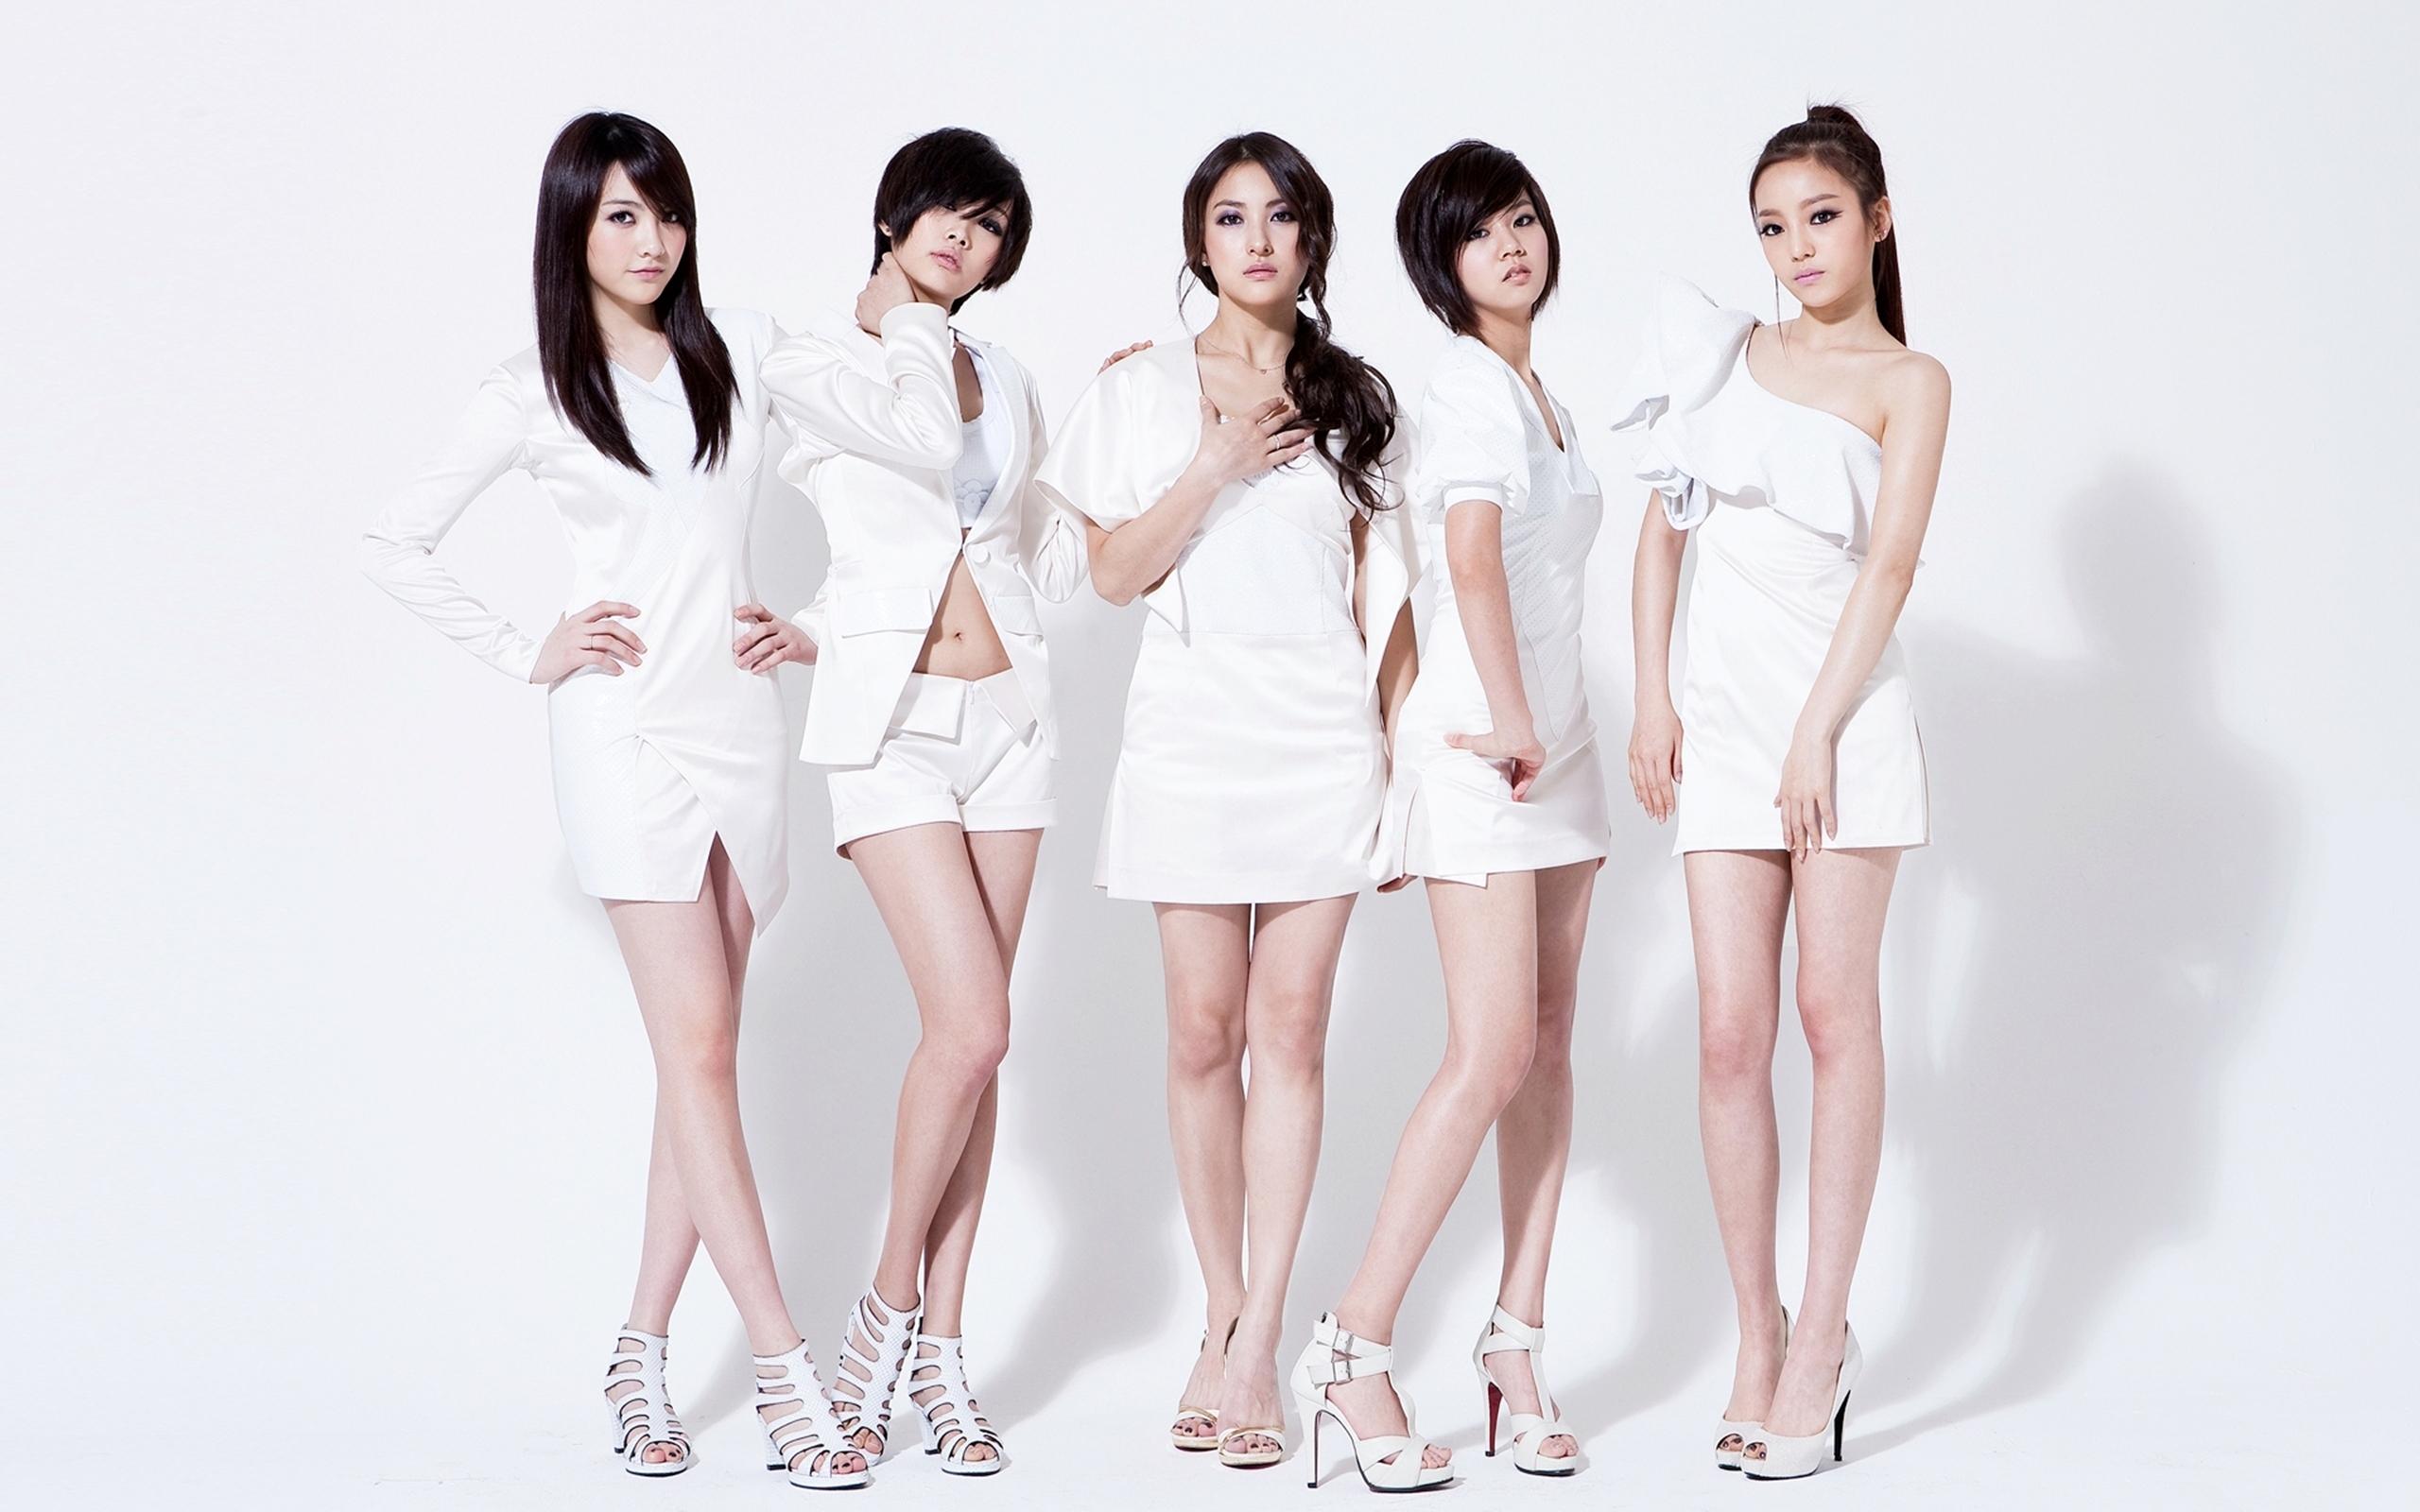 Coming to america k pop girl group presumed prostitutes - beritahaticom